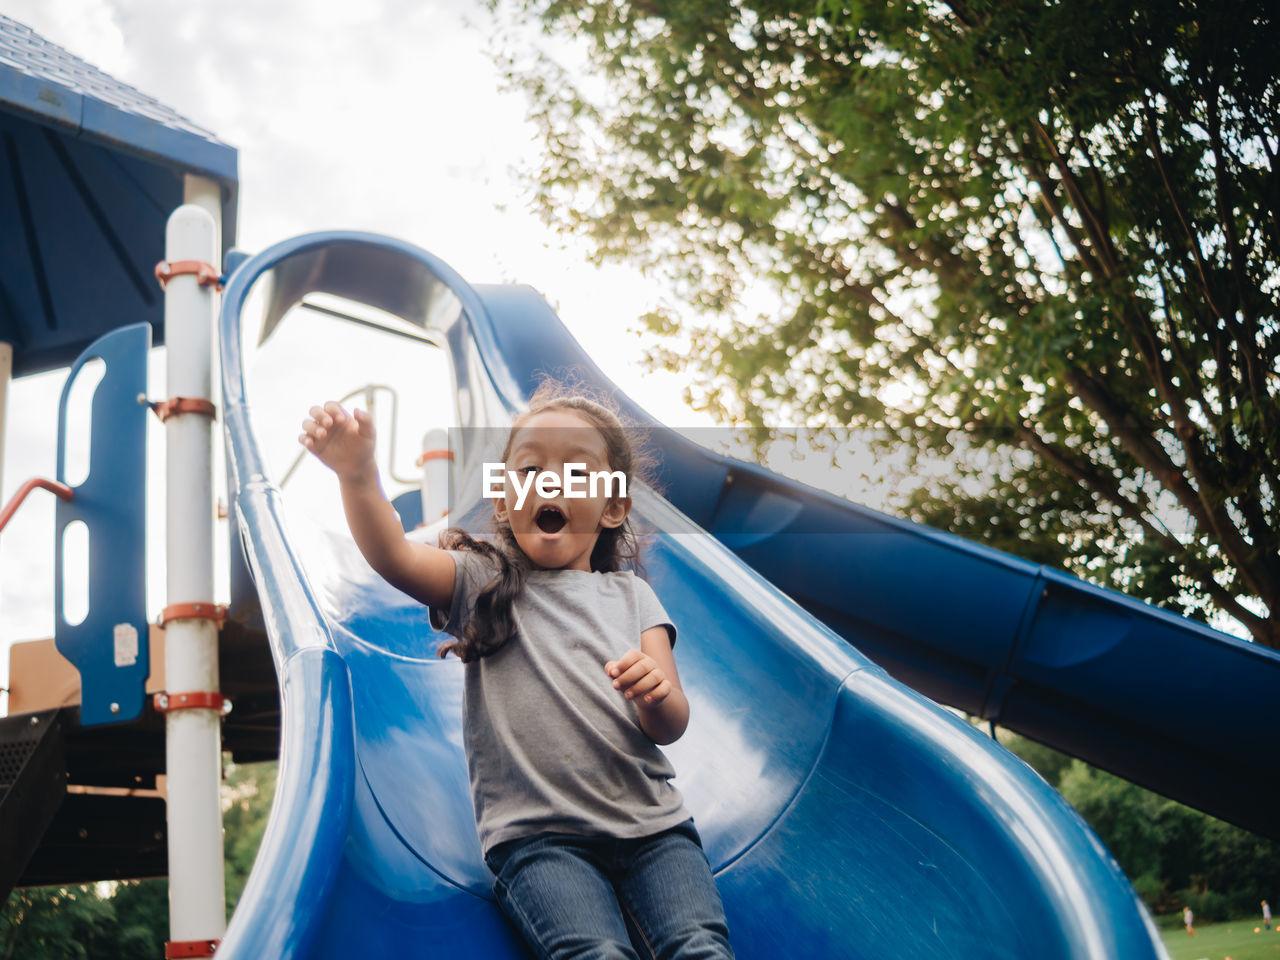 Cute girl standing on slide at park